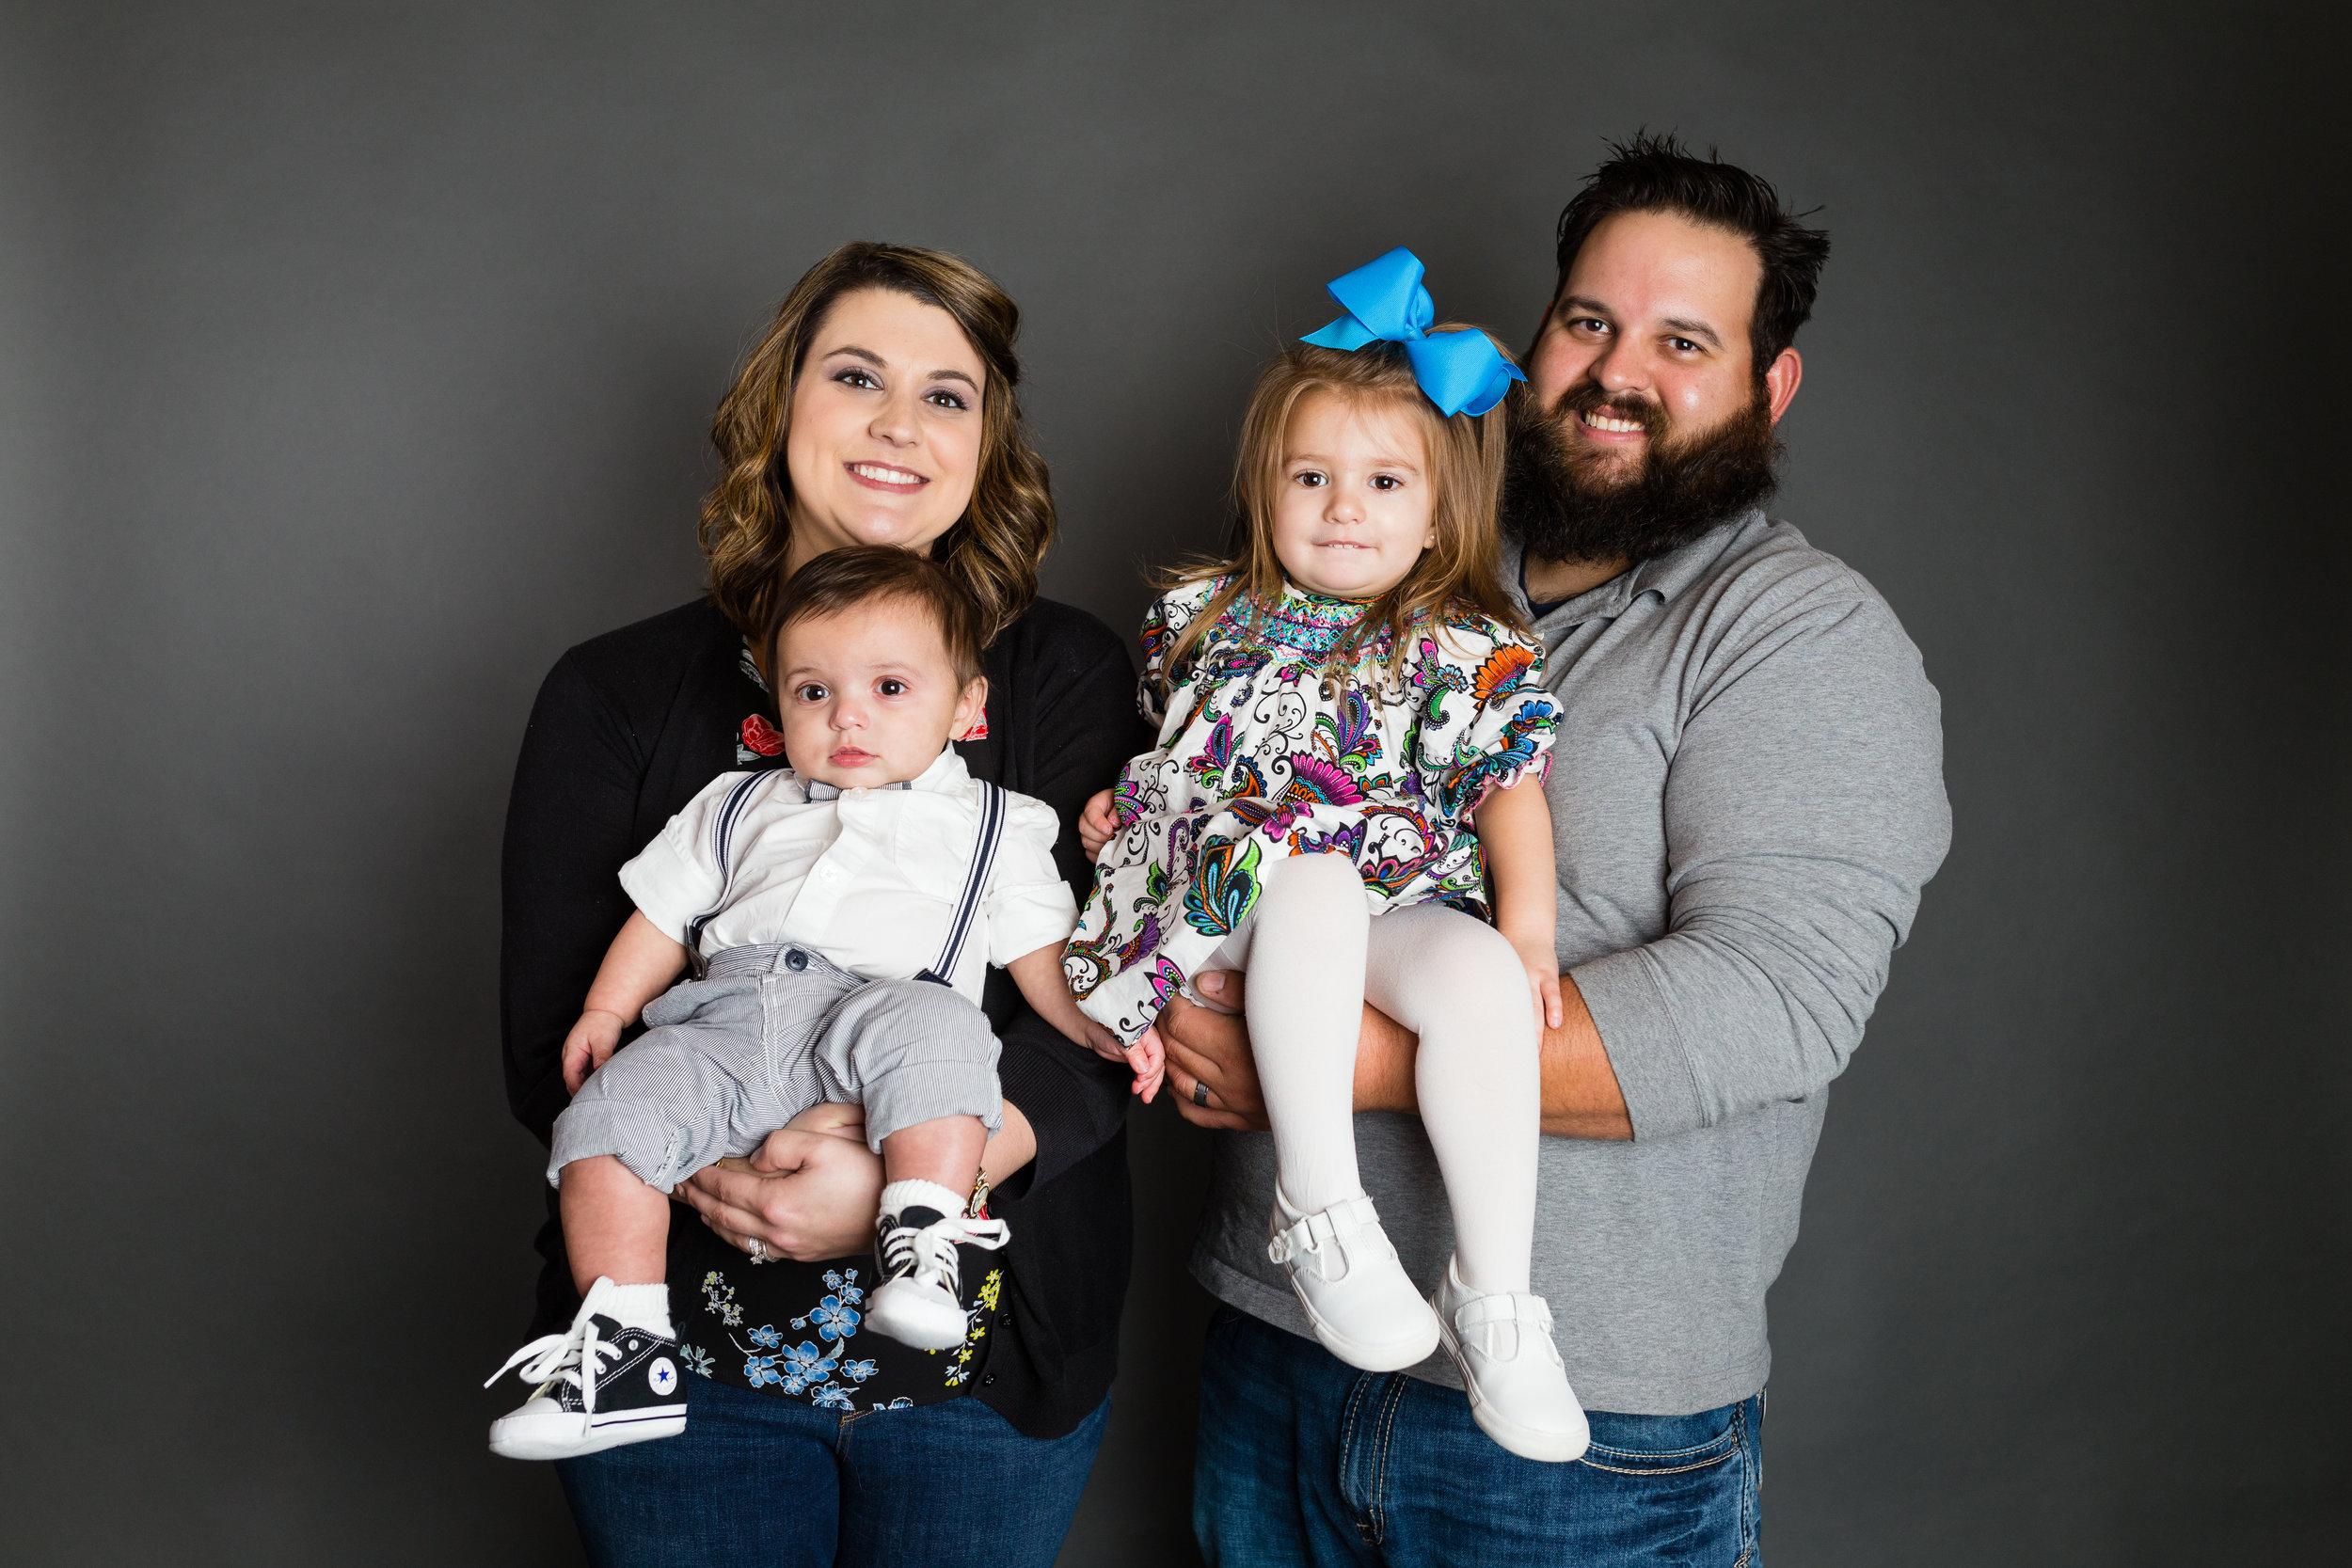 Family-child-portrait-lafayette-broussard-youngsville-photographer-29.jpg